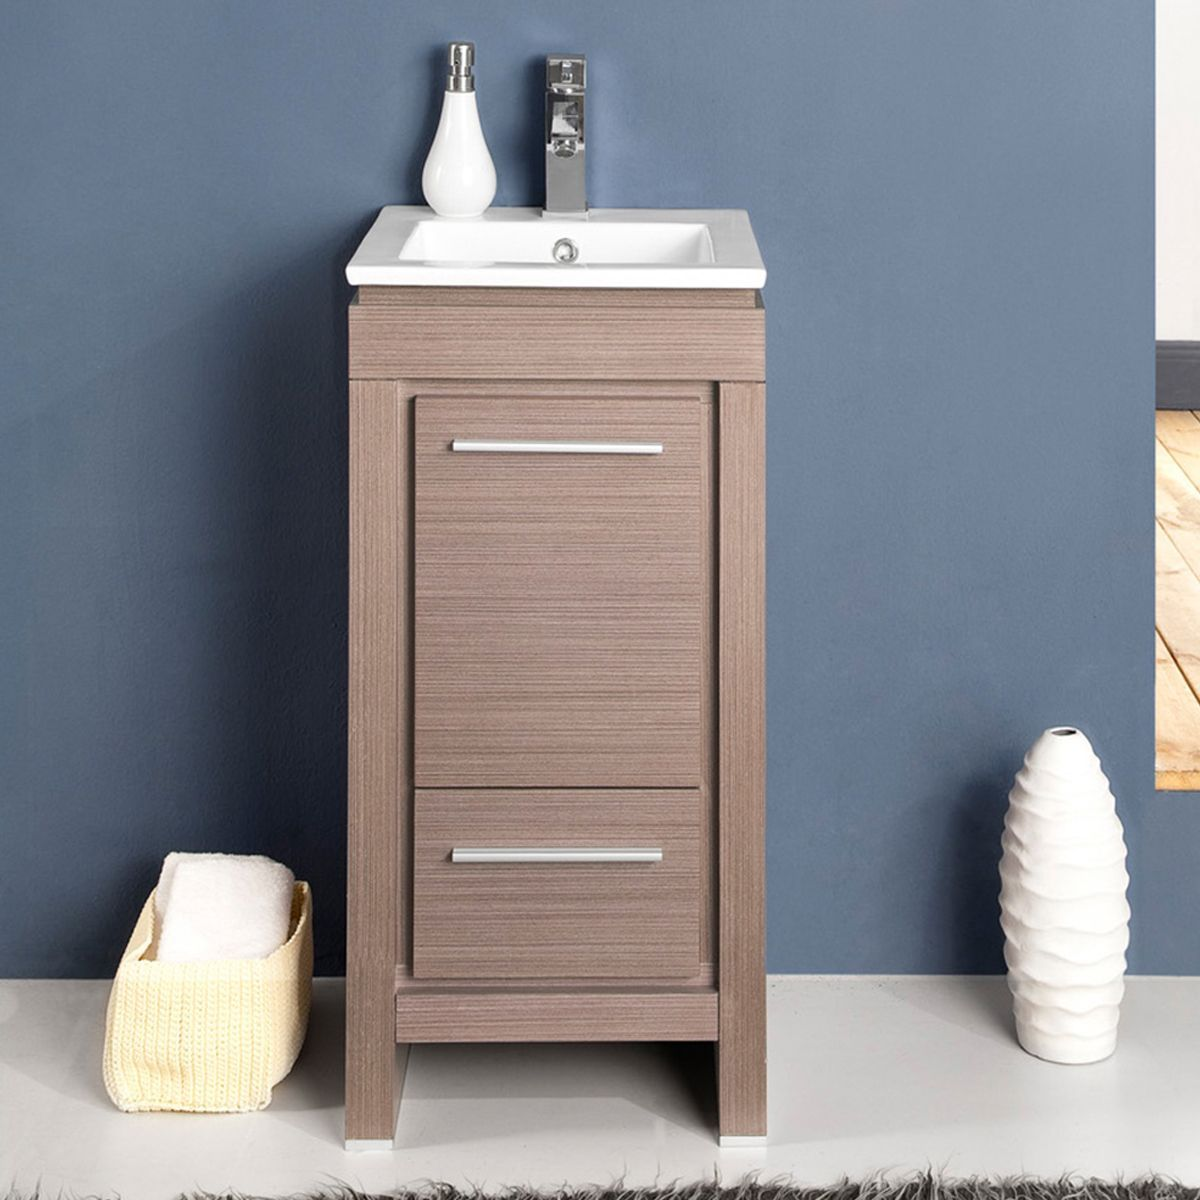 Narrow Bathroom Vanities With 8 18 Inches Of Depth Modern Bathroom Cabinets Bathroom Vanity Small Bathroom Vanities